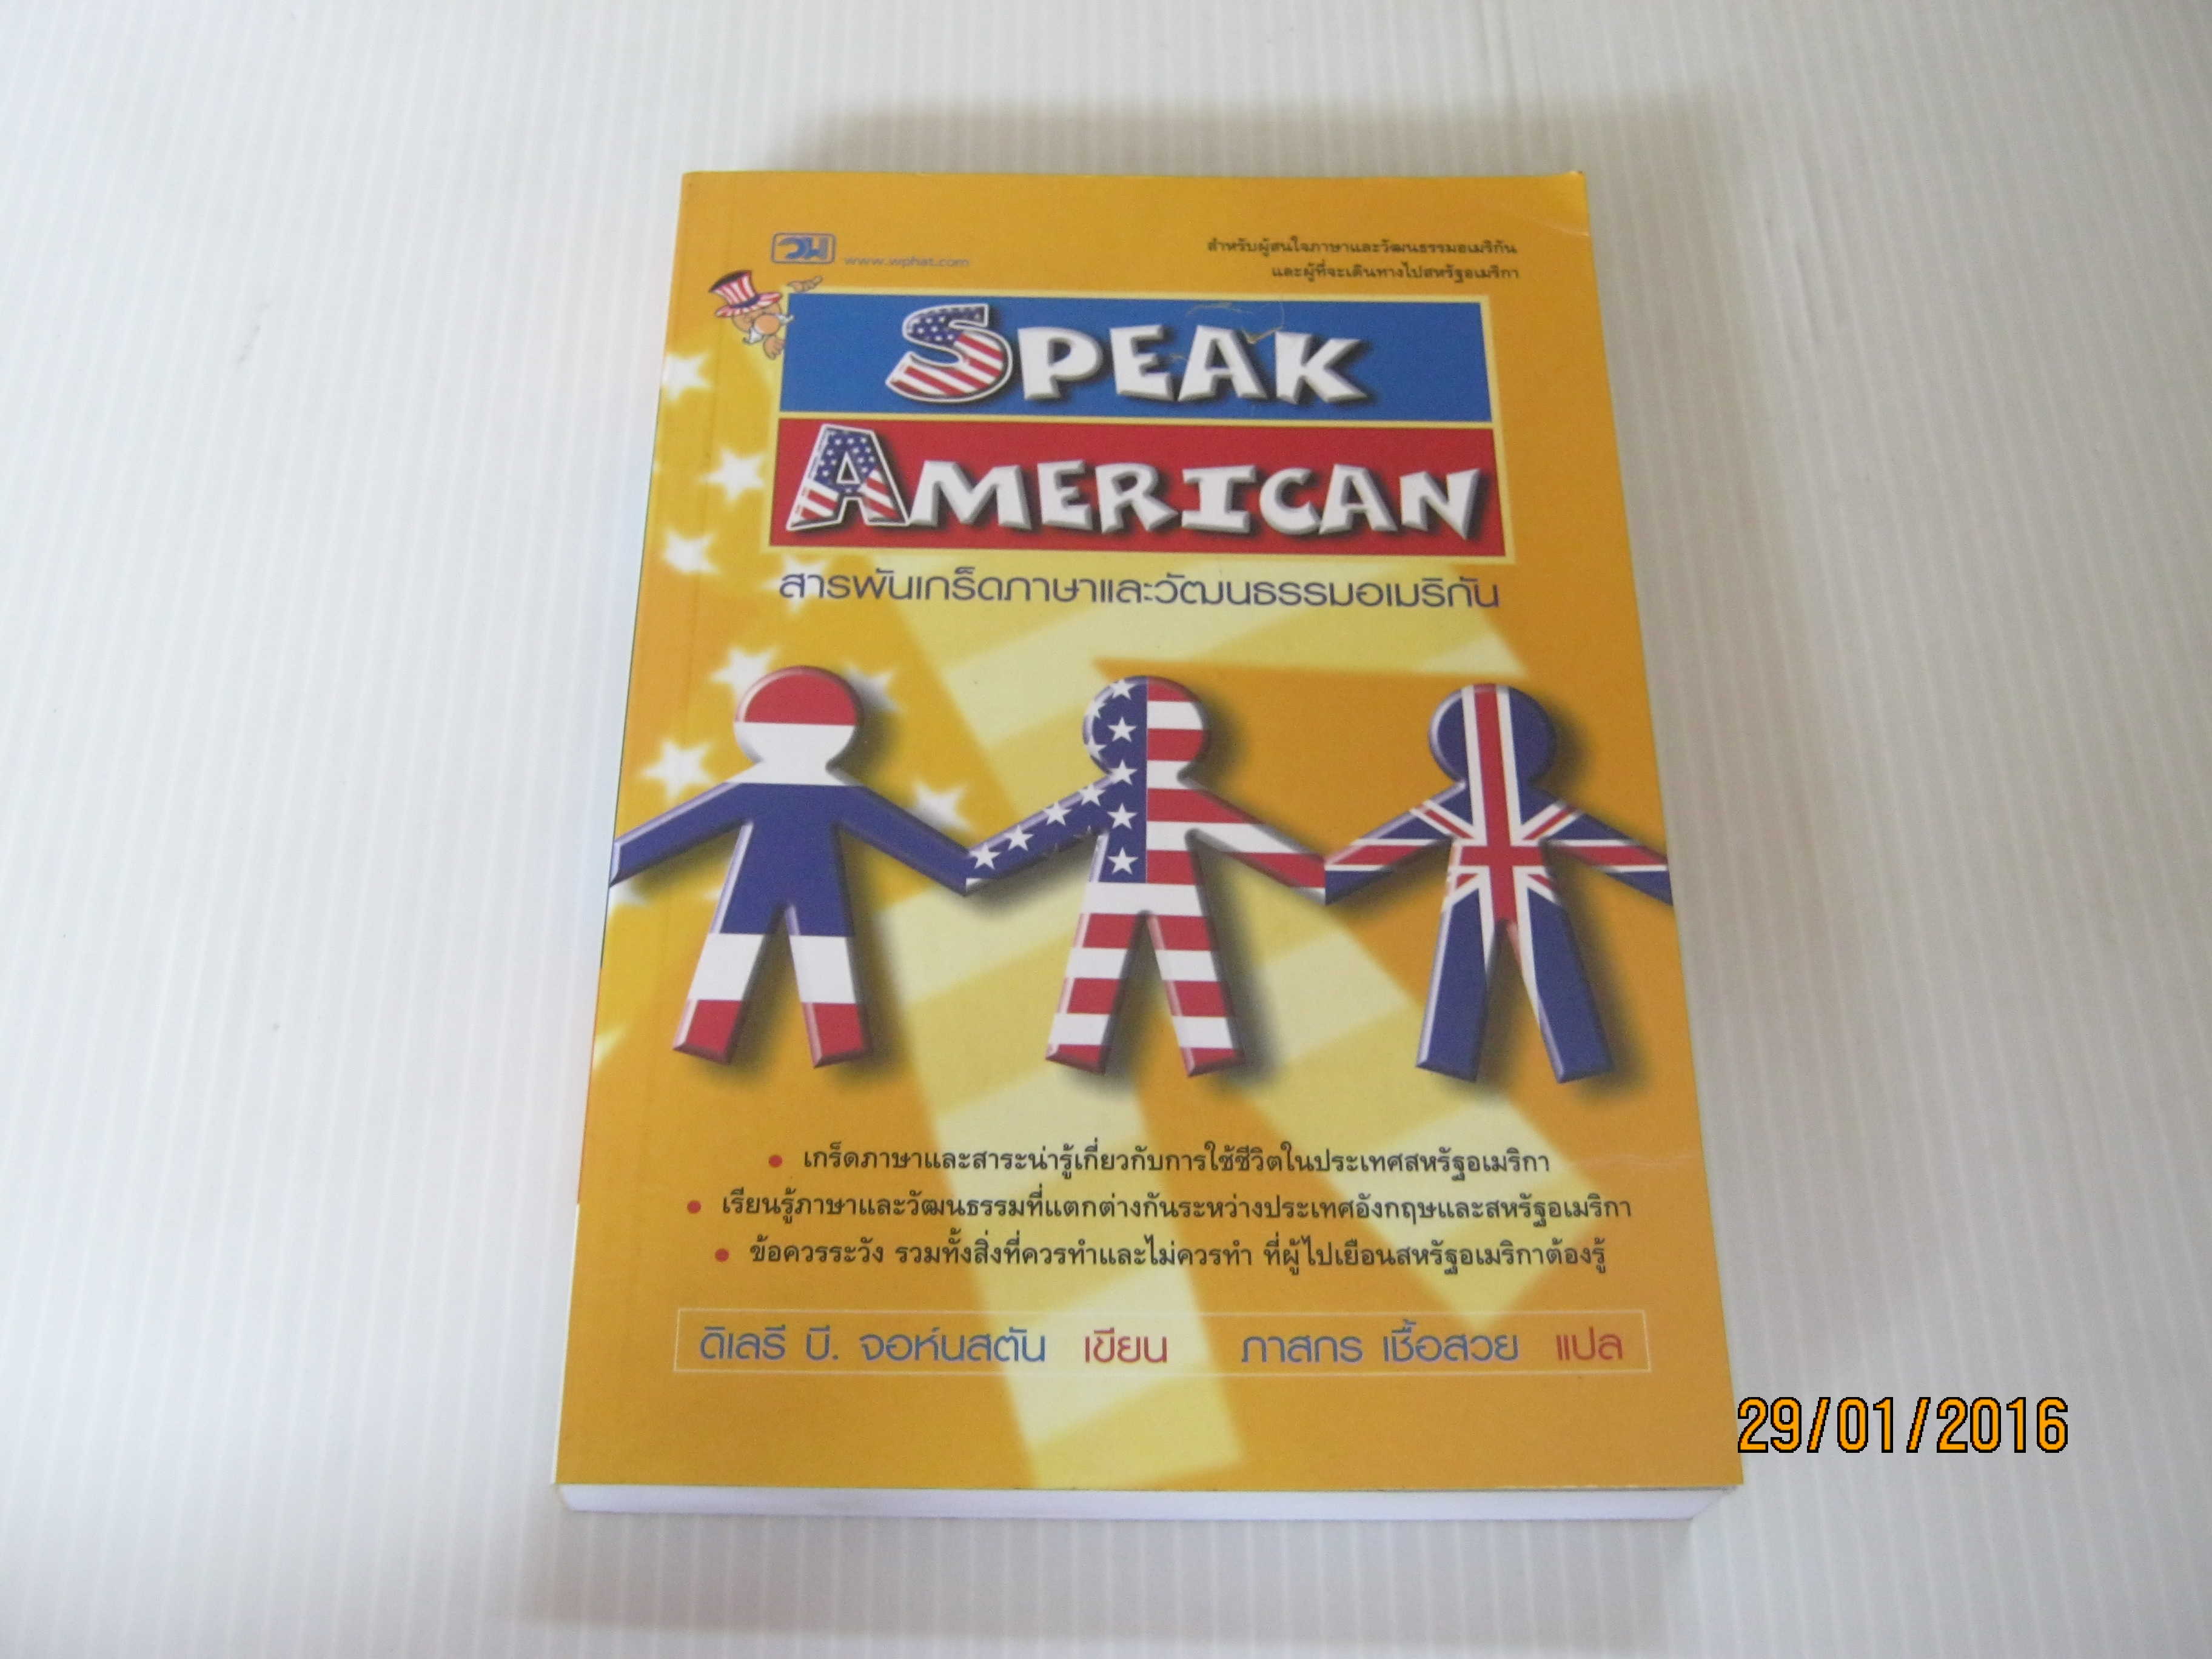 Speak American สารพันเกร็ดภาษาและวัฒนธรรมอเมริกัน ดีเลรี บี. จอห์นสตัน เขียน ภาสกร เชื้อสวย แปล